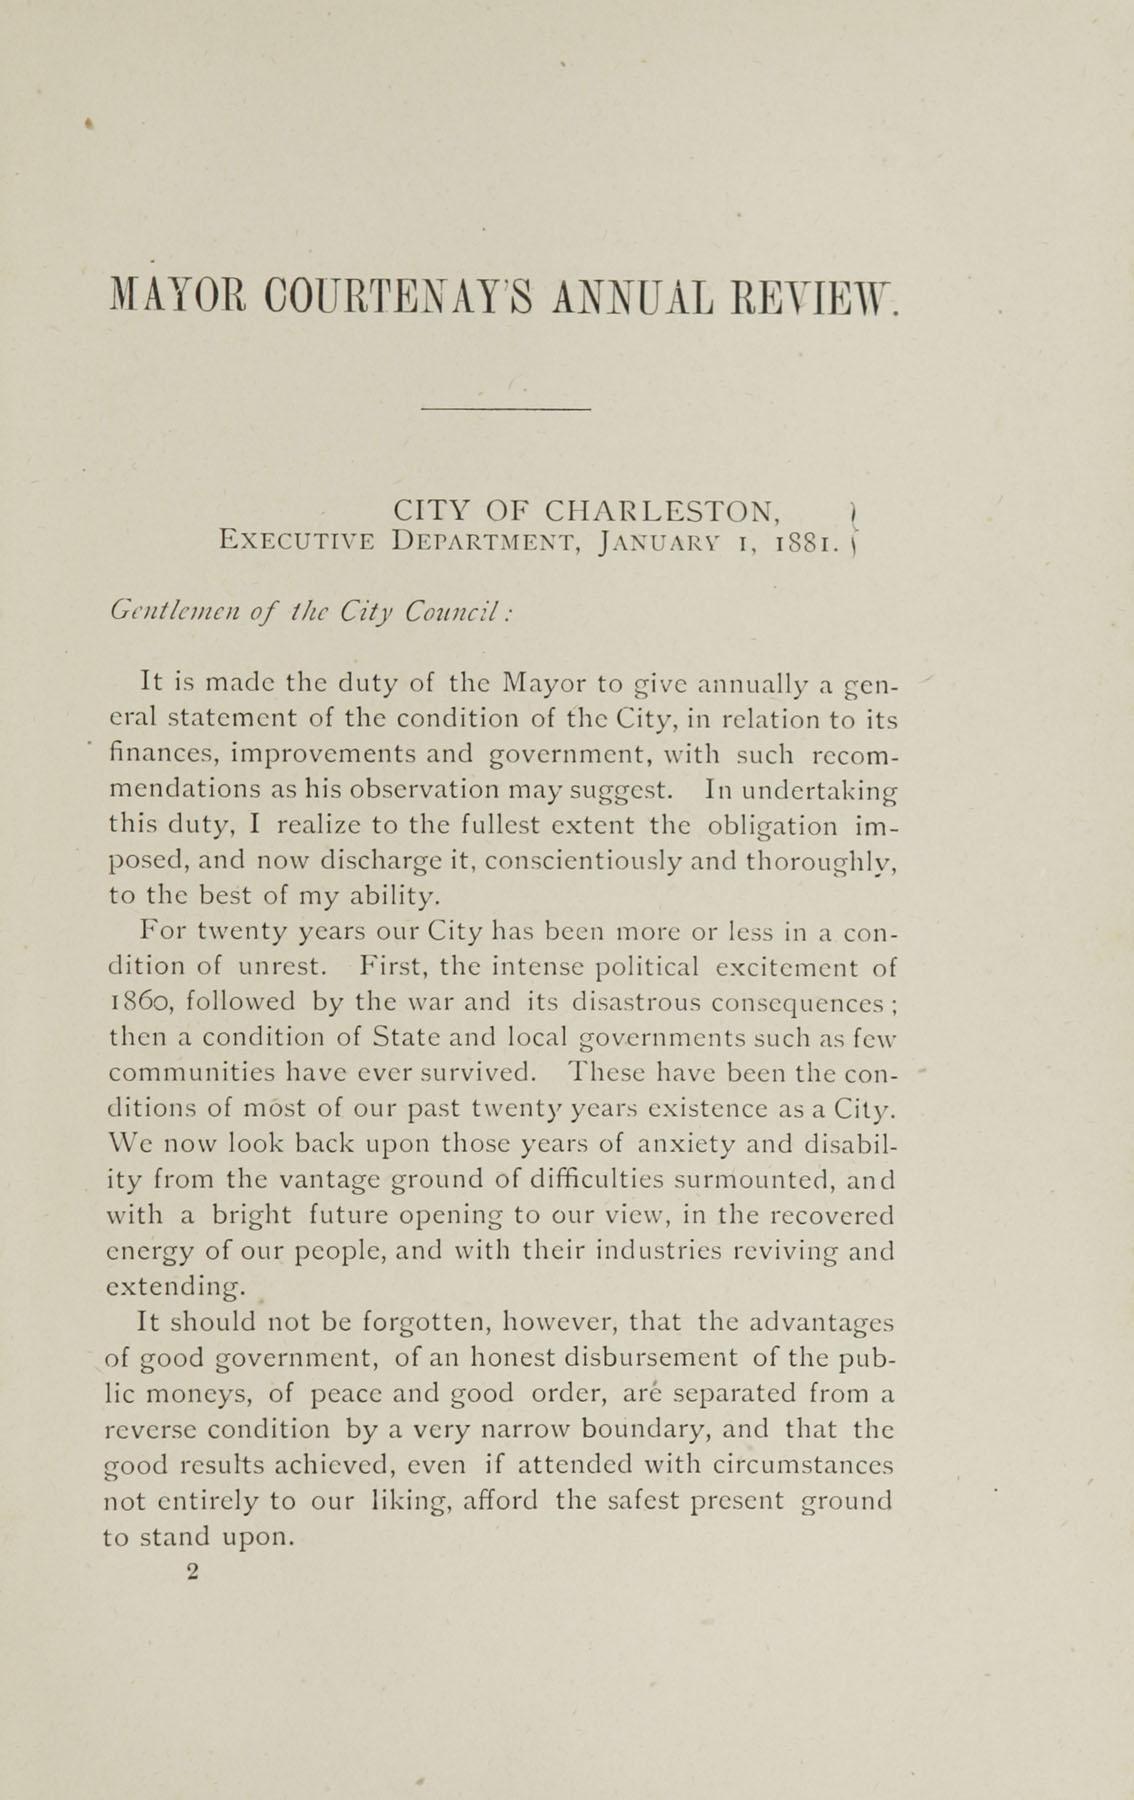 Charleston Year book, 1880, page 1